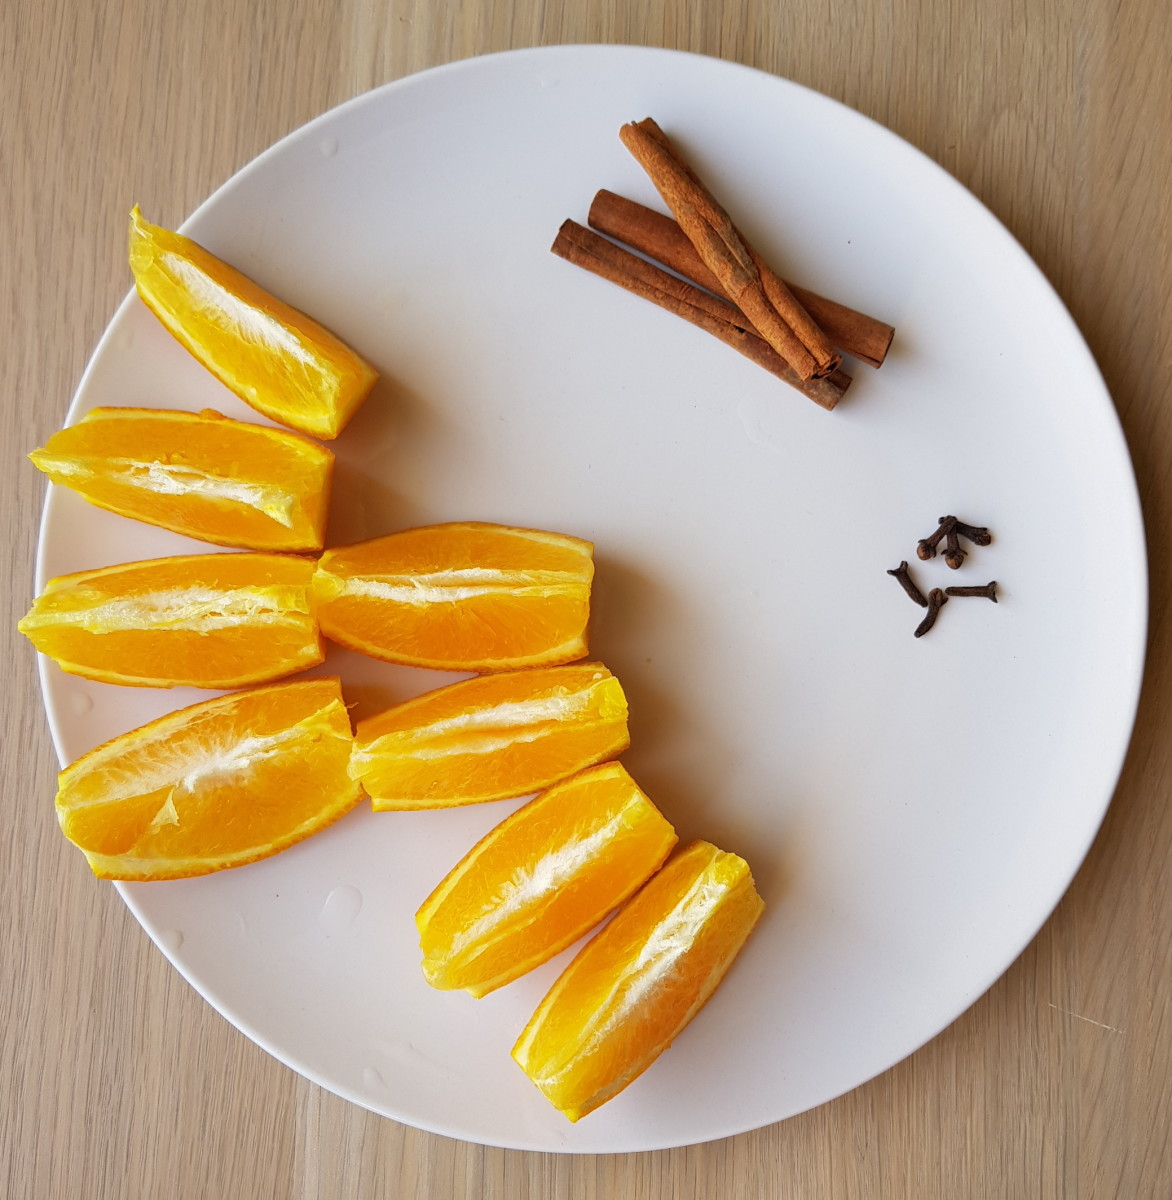 Add flavors: cut oranges, cinnamon, and cloves.